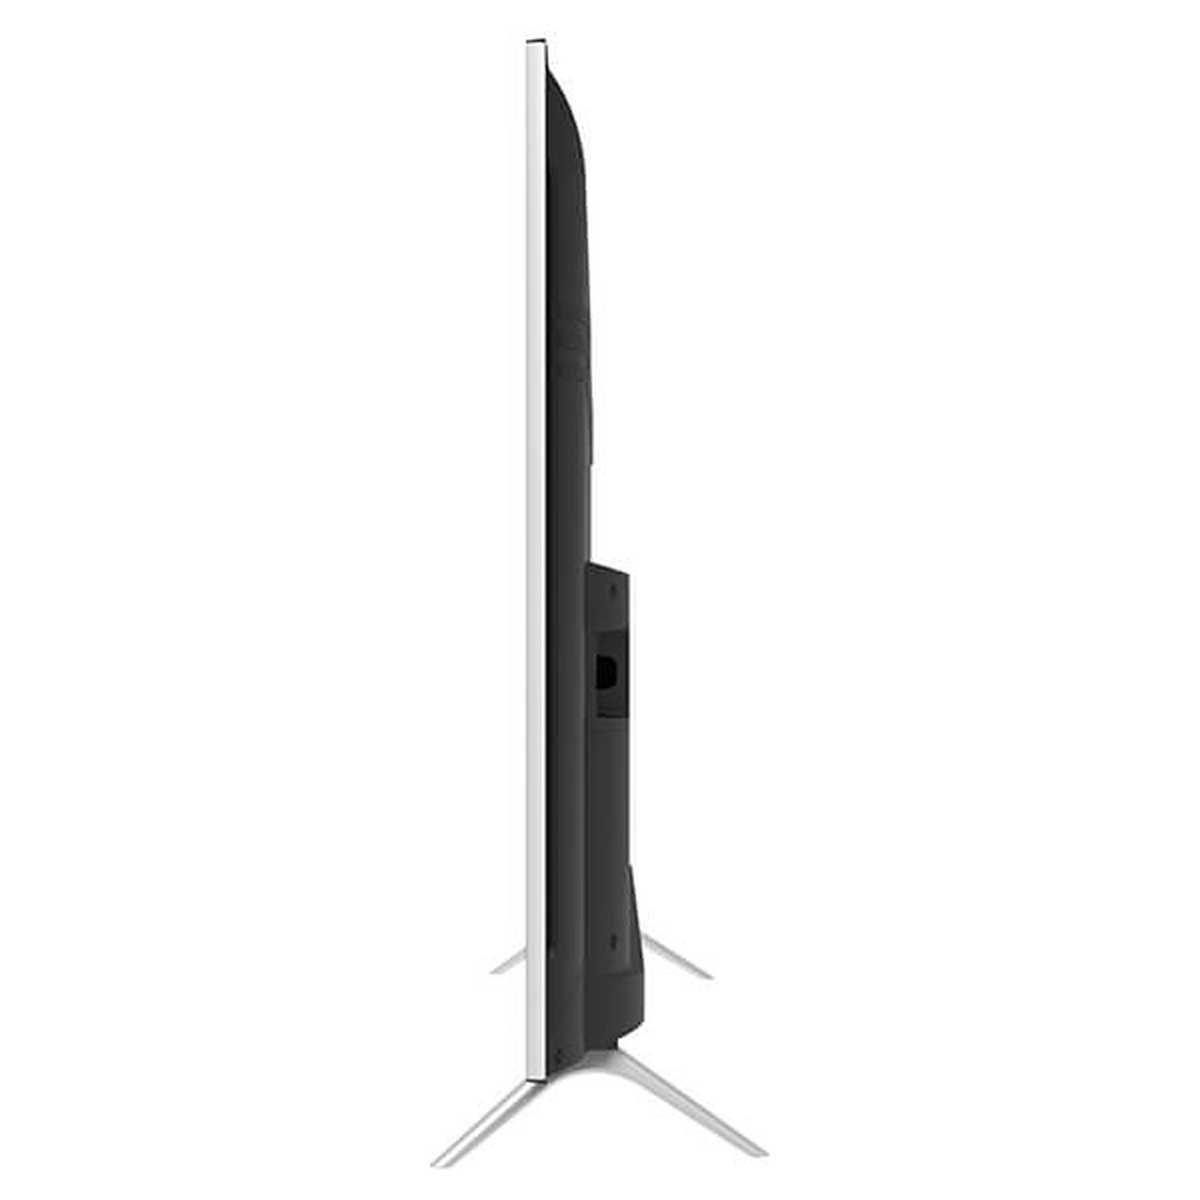 Tcl 40s6500fs 40 Inch 101cm Smart 4k Full Hd Led Lcd Tv Appliances